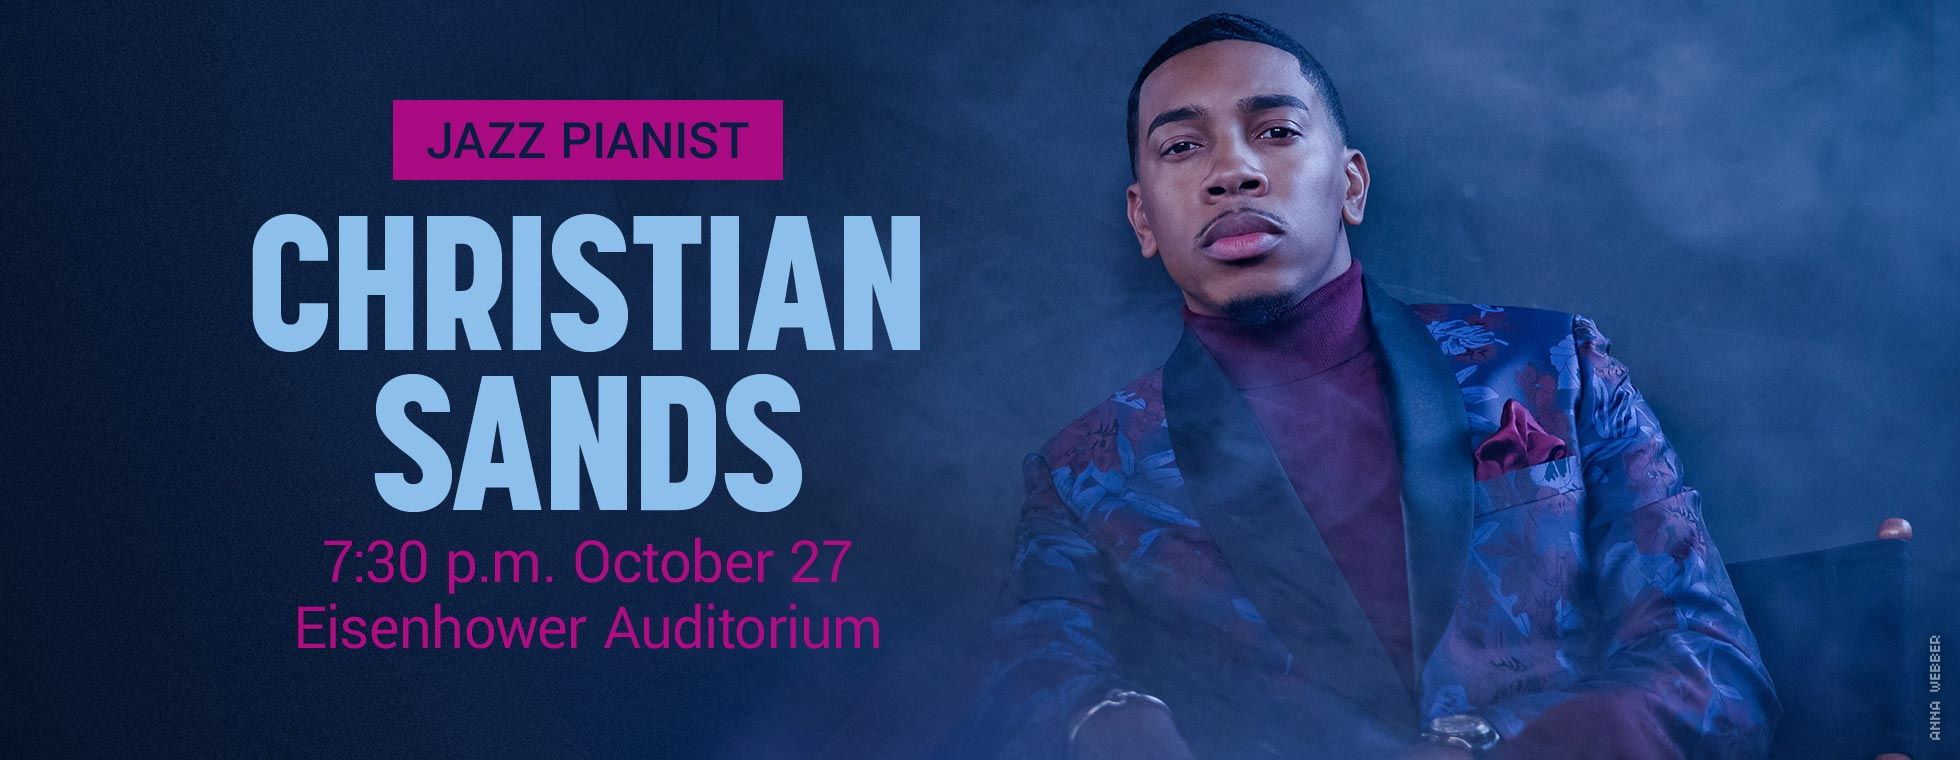 Coming next: Jazz pianist Christian Sands 7:30 p.m. October 27 at Eisenhower Auditorium.